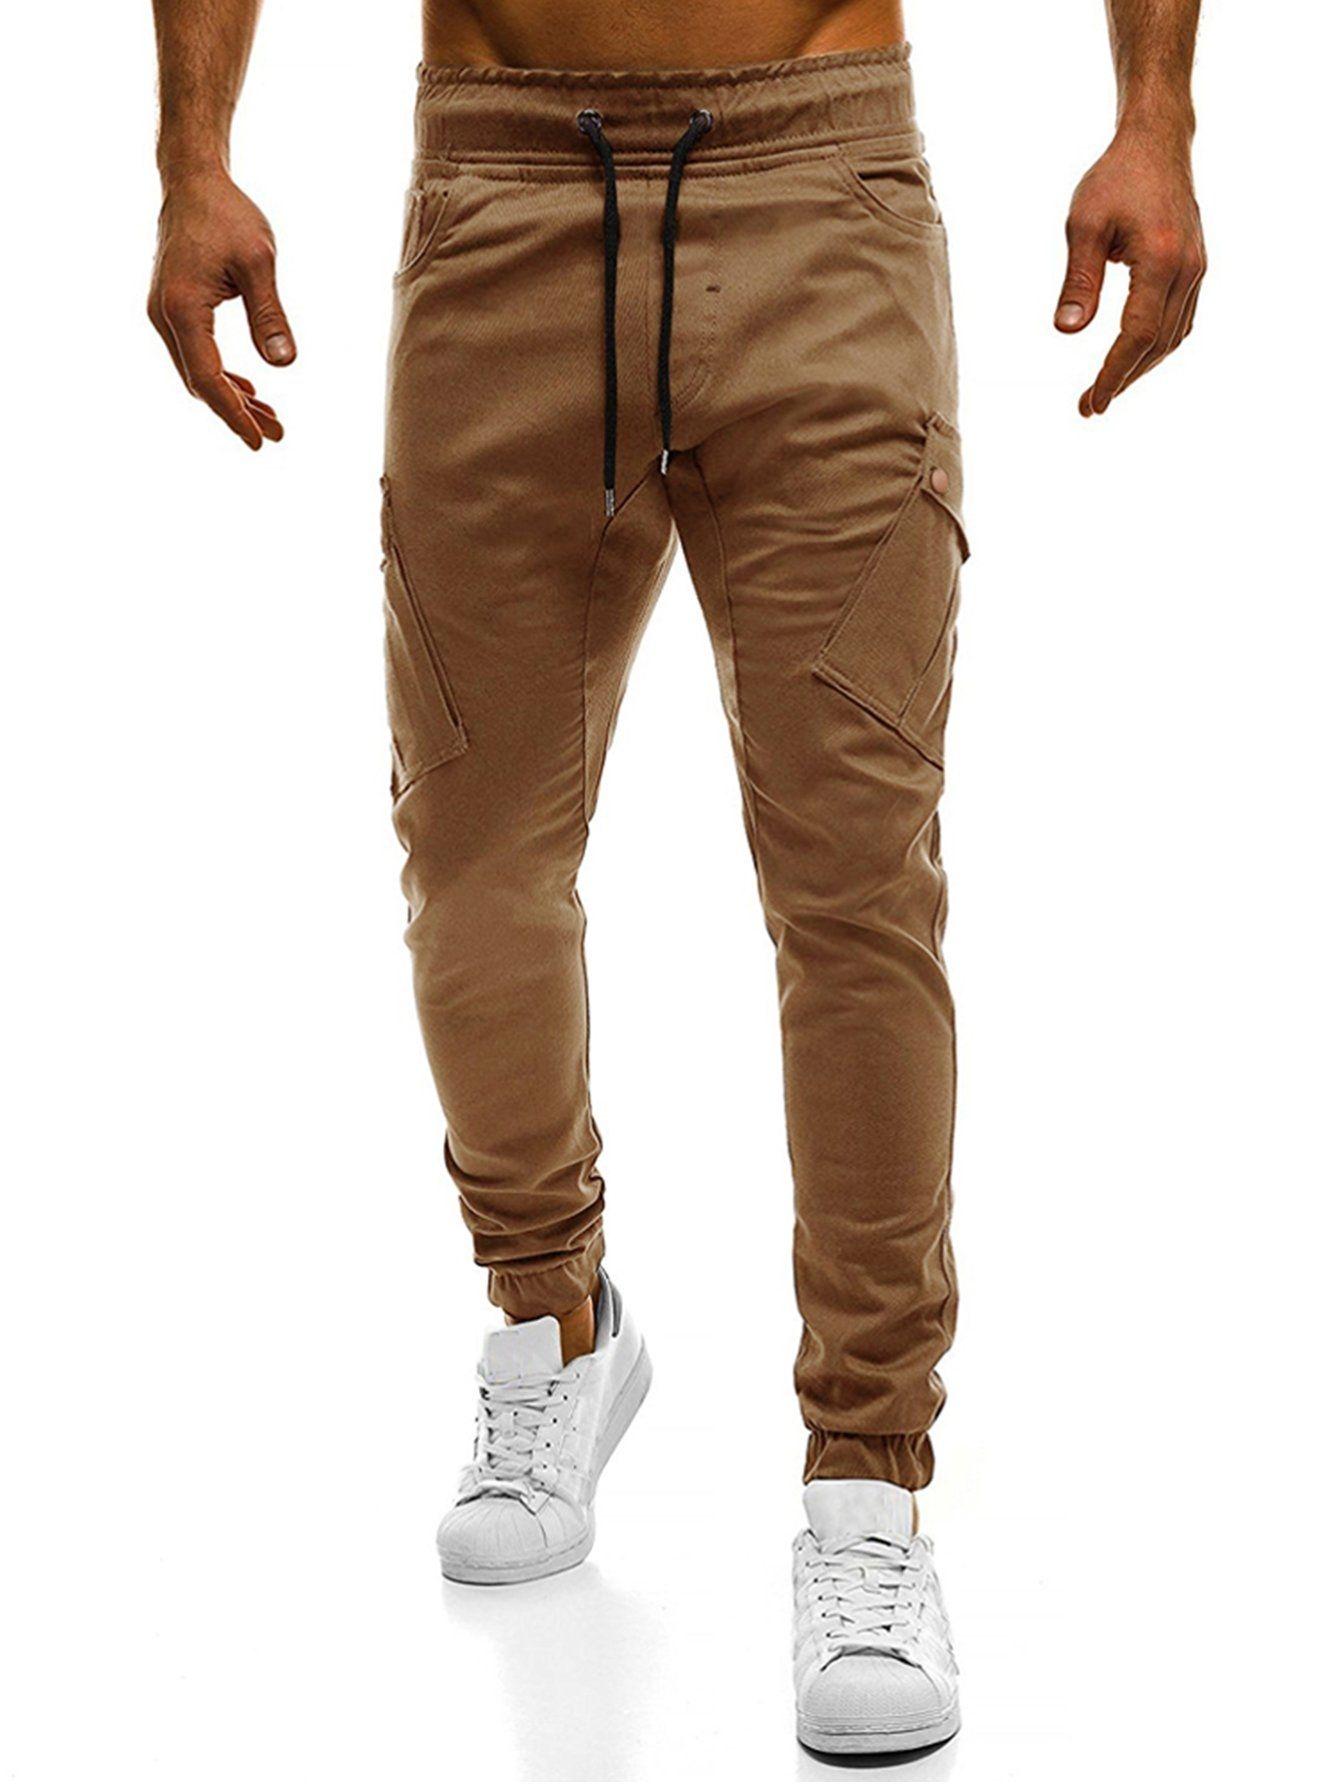 595c74701ec6 SHEIN Men Pockets Decoration Plain Drawstring Pants Price in Egypt ...